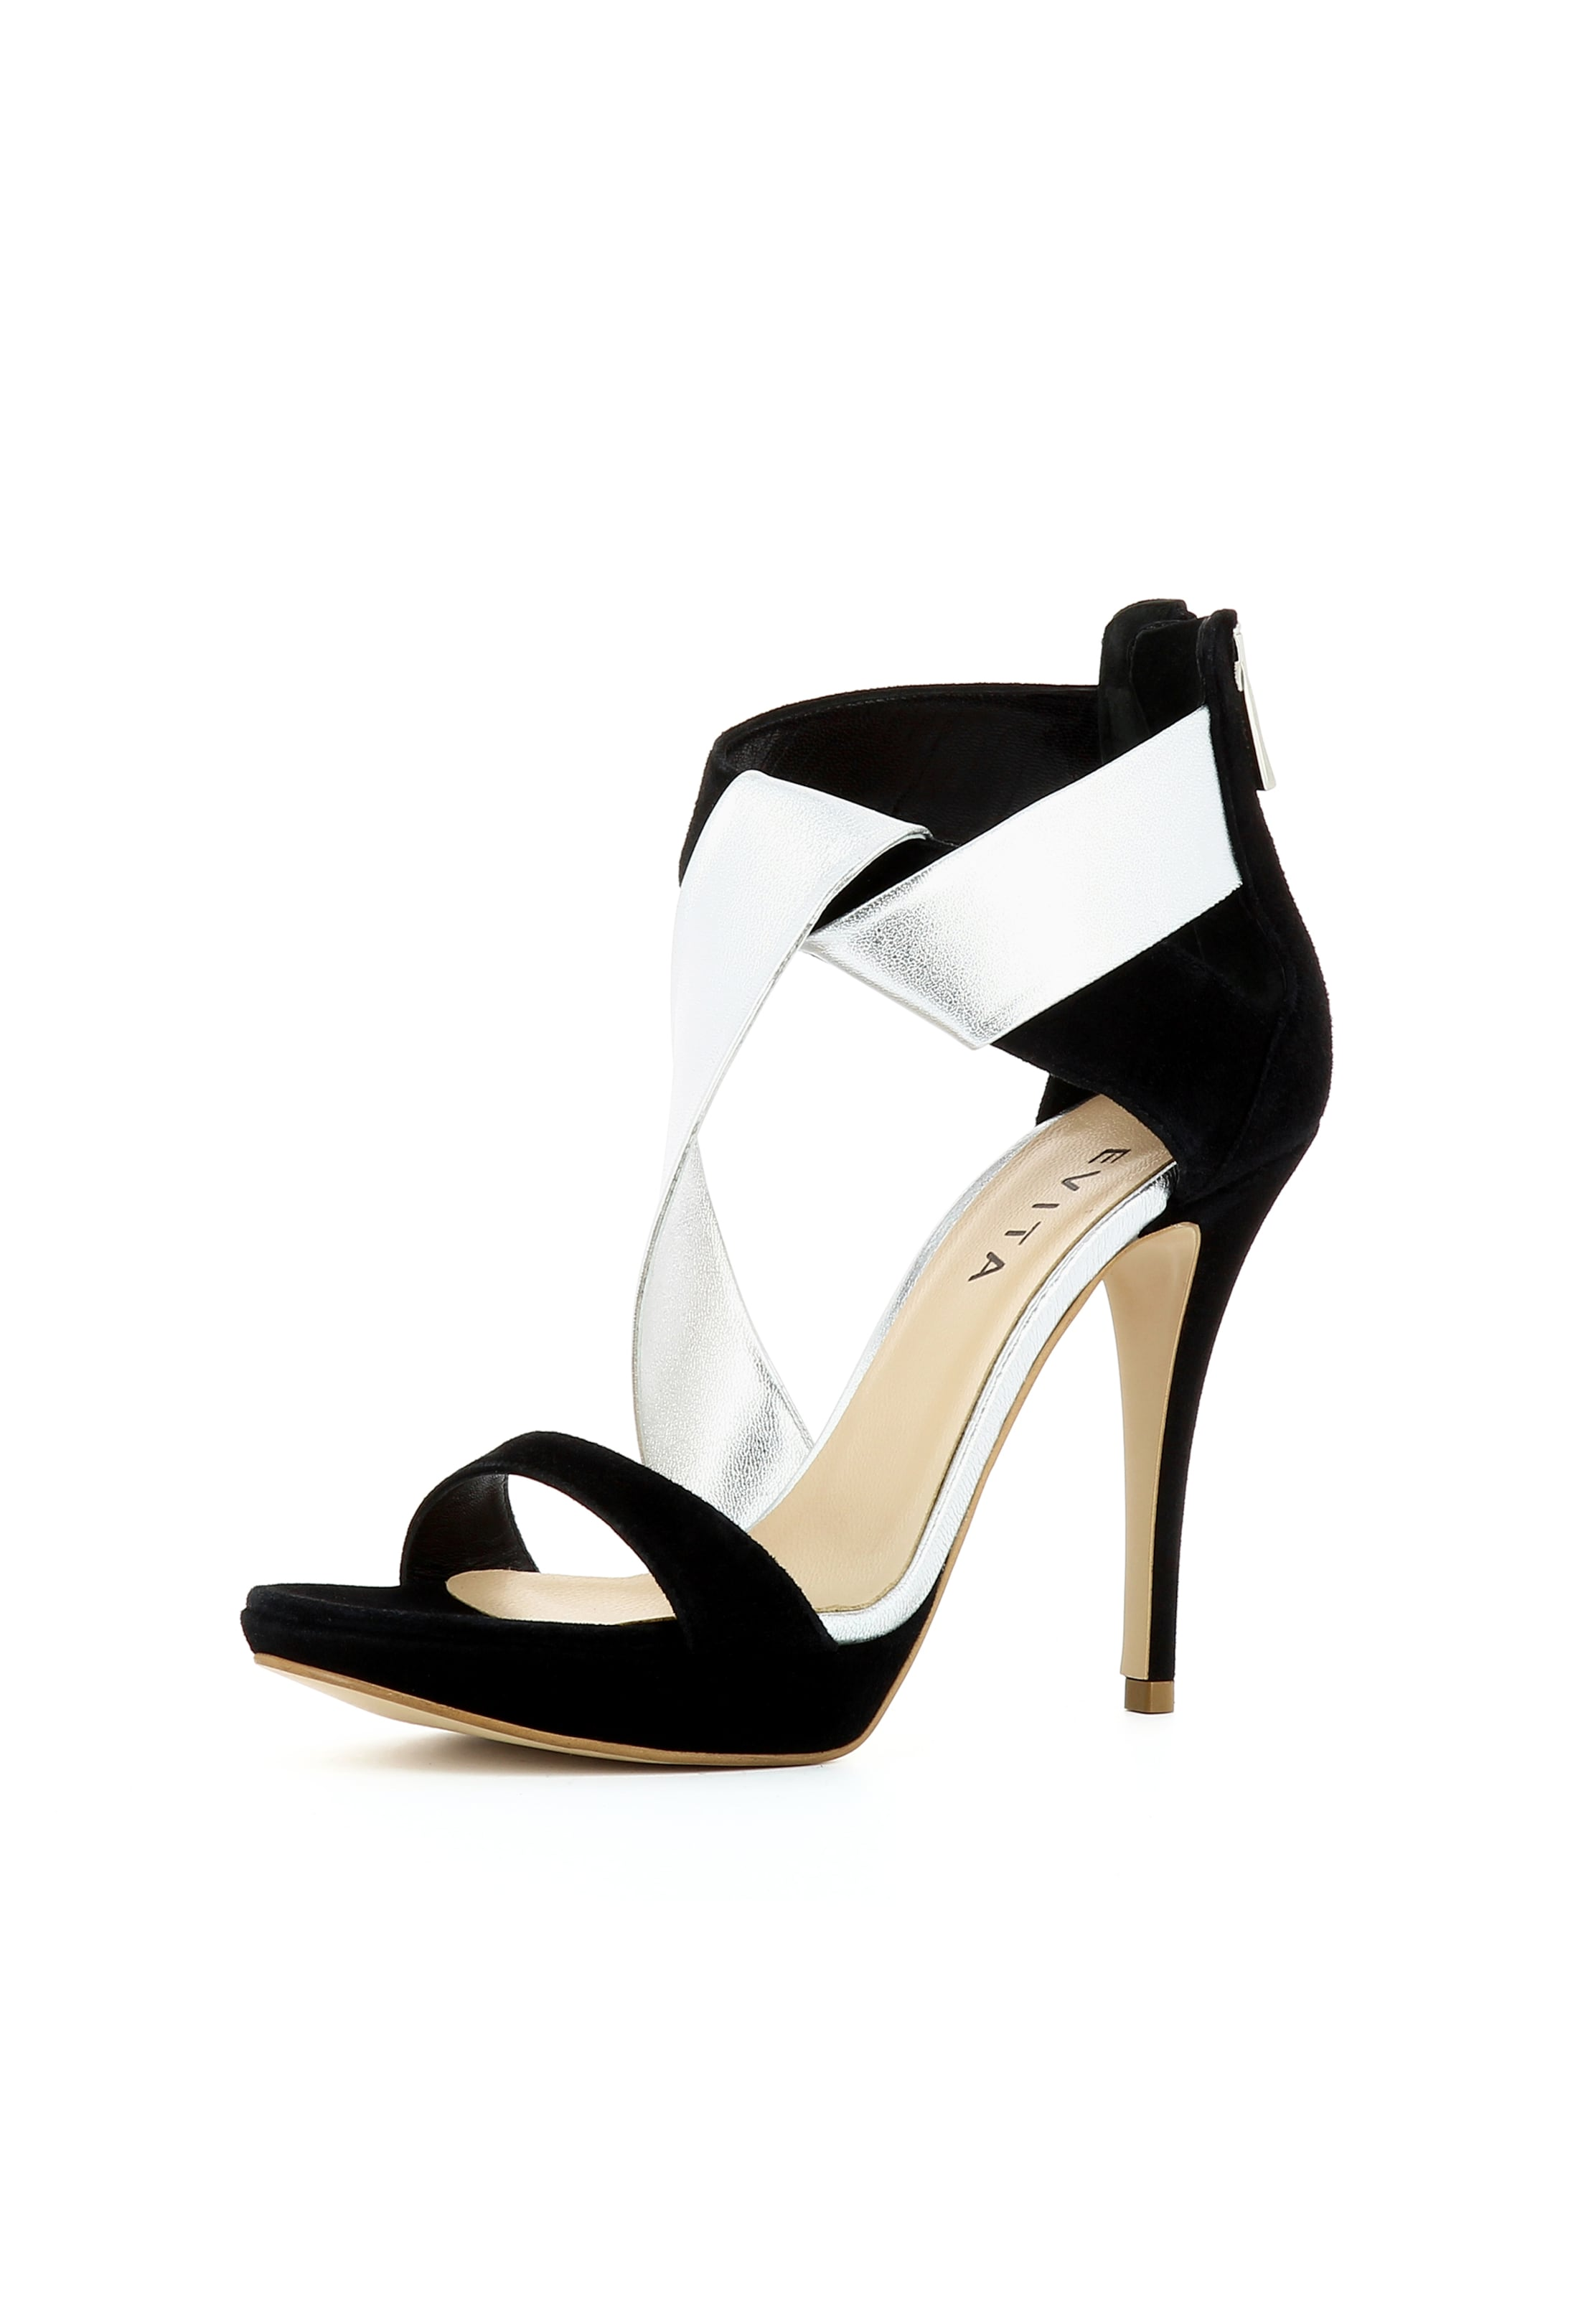 Haltbare Mode billige Schuhe EVITA | Damen Sandalette Schuhe Schuhe Schuhe Gut getragene Schuhe e88ad9